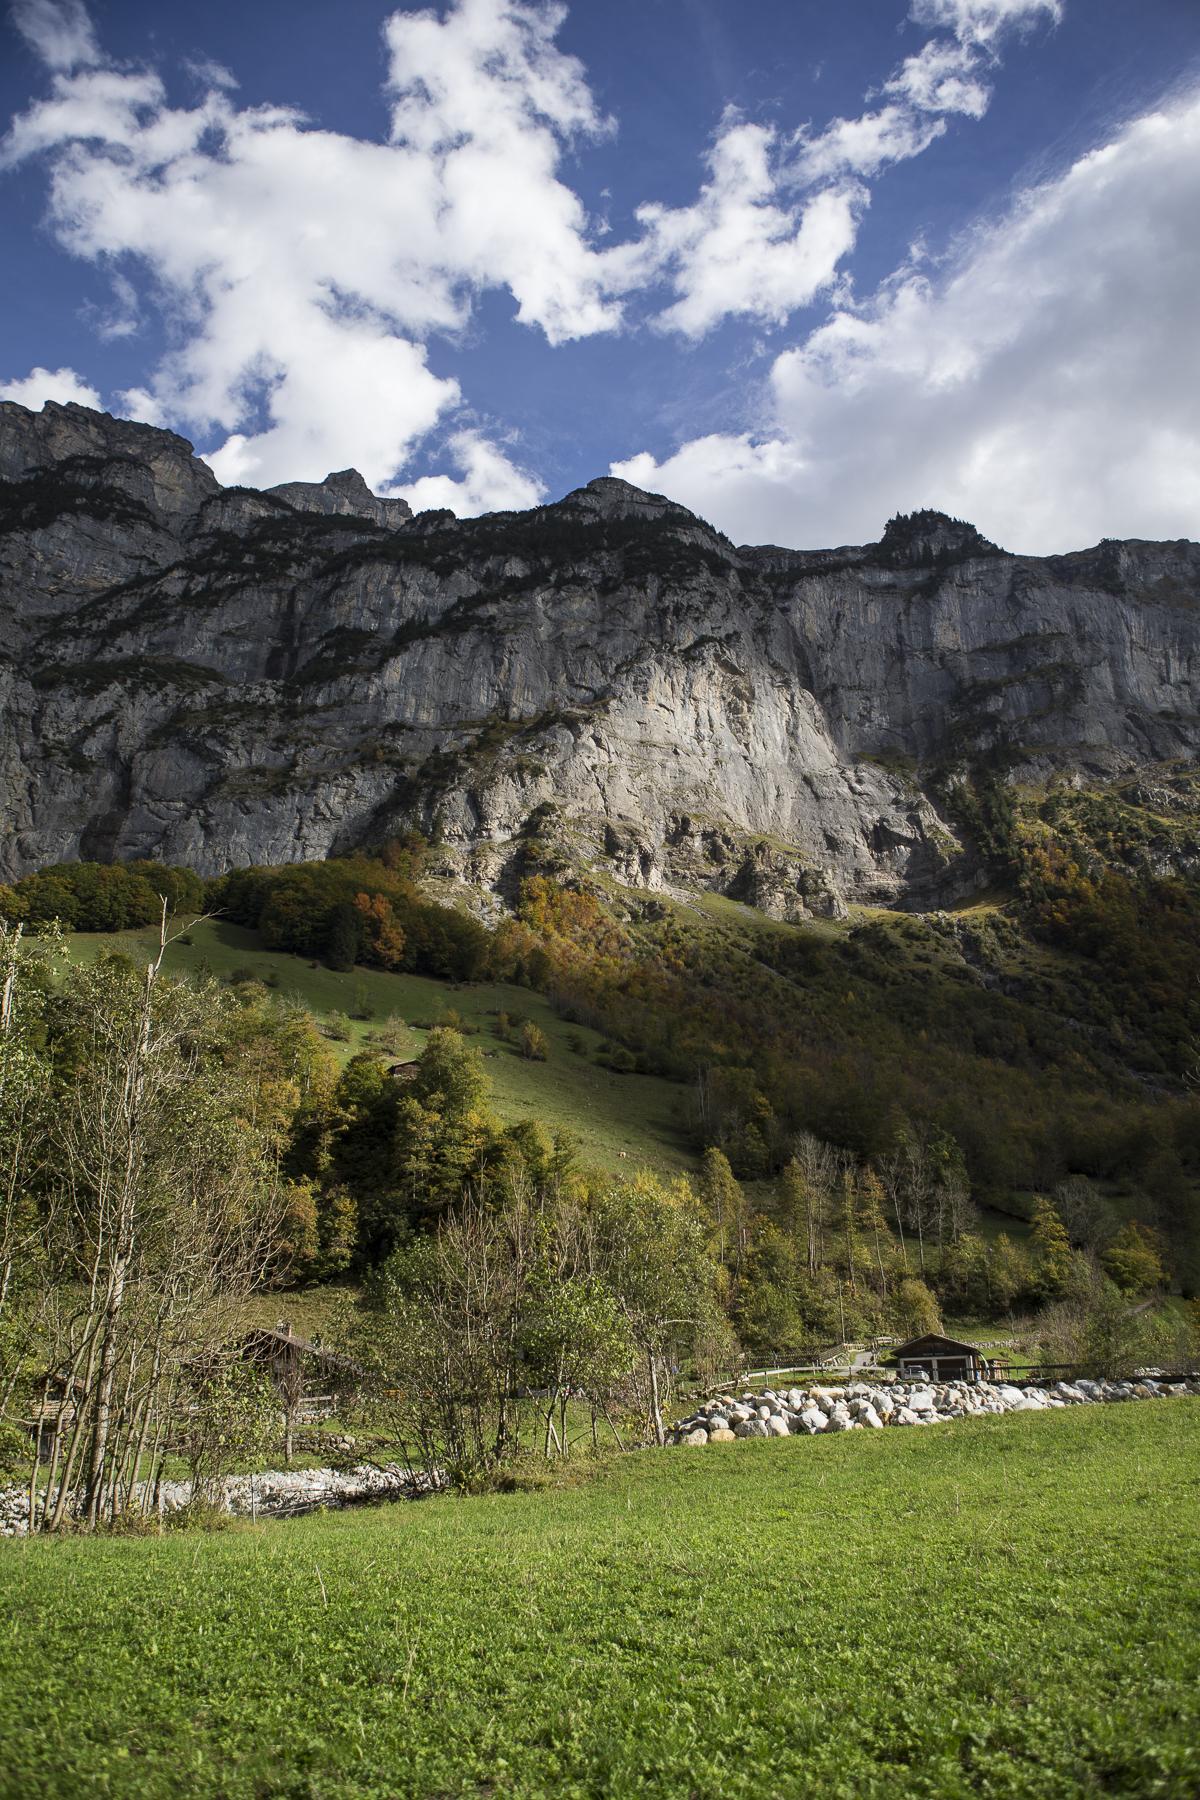 MountainsAndCows-8.jpg